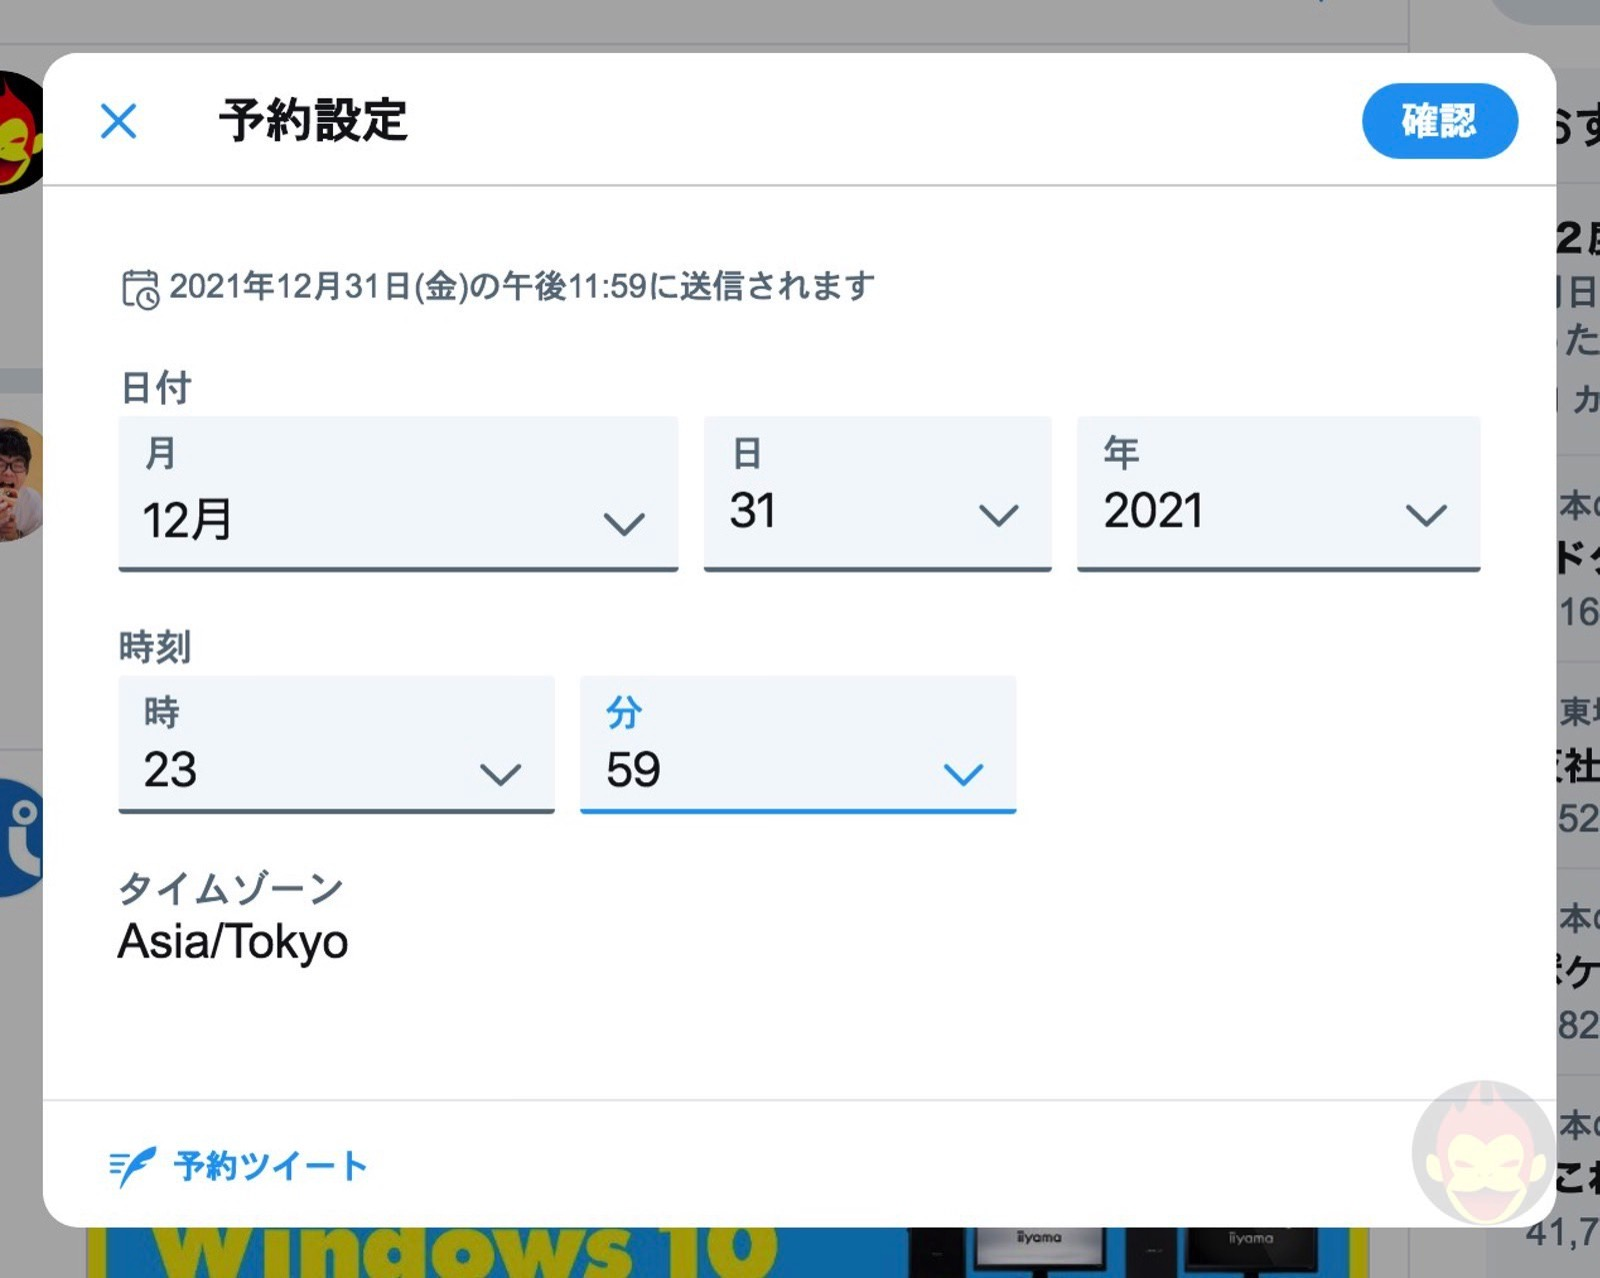 twitter-schedule-tweet-feature-in-testing-200.jpg